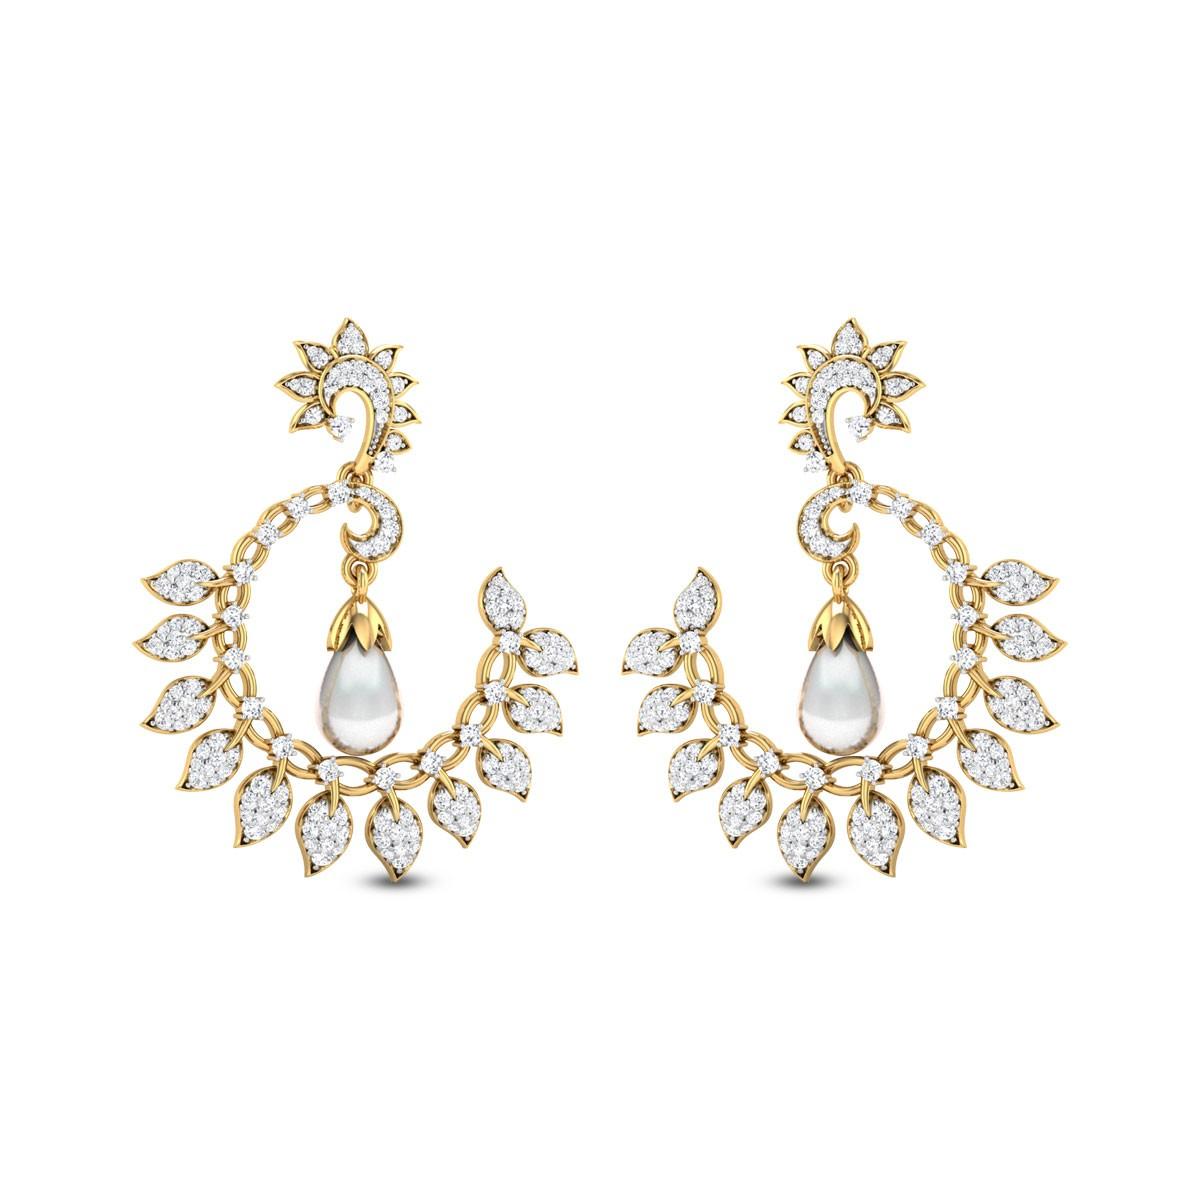 Leafy Leilani Diamond Earrings